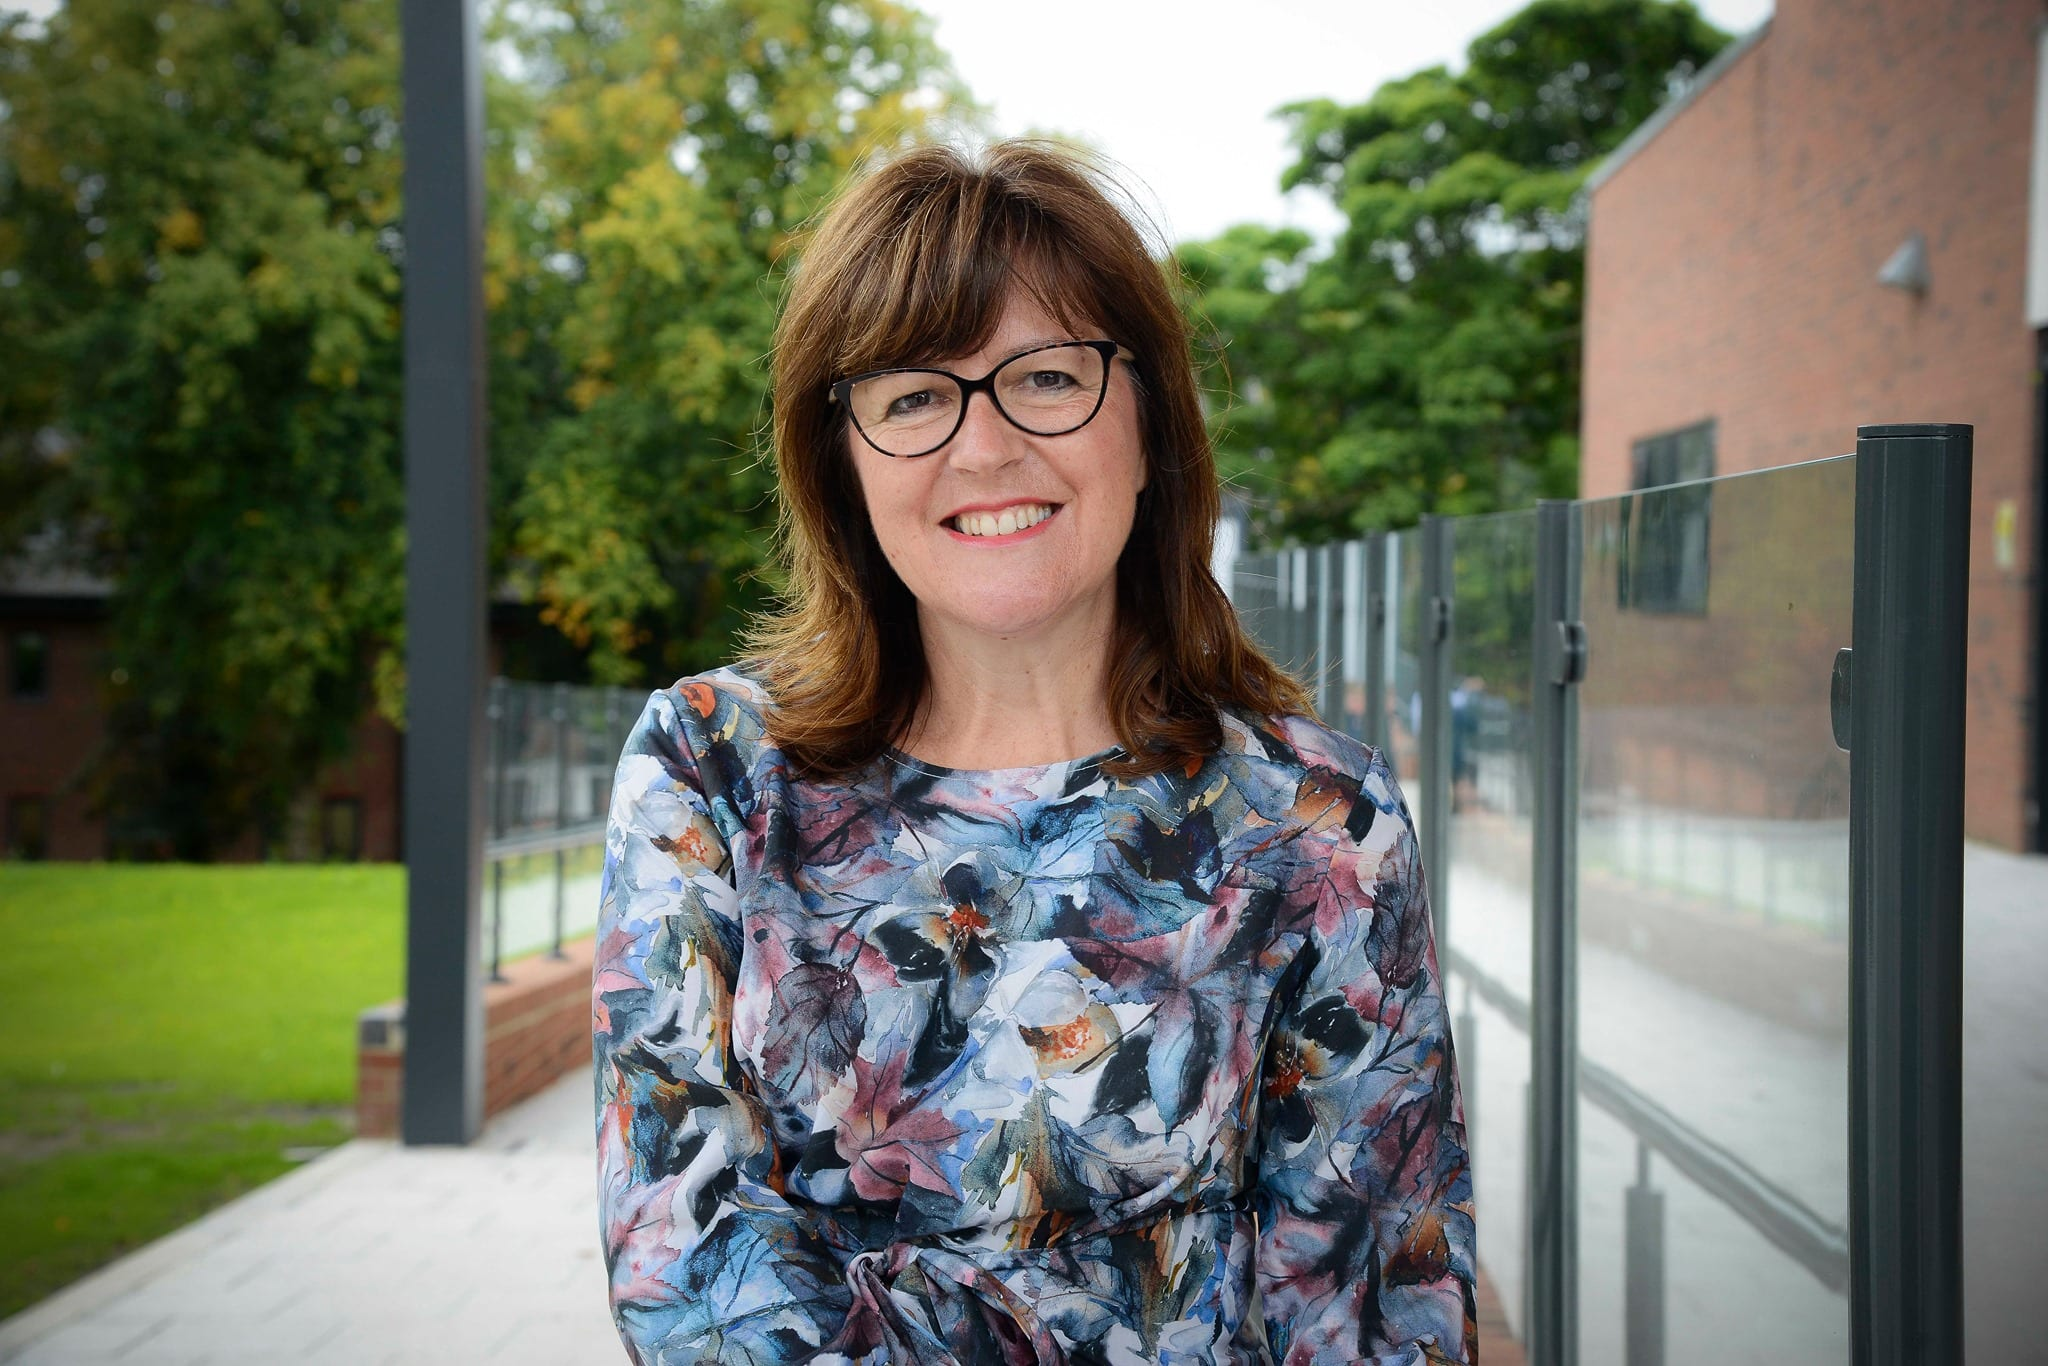 Amanda Melton, Principal awarded CBE